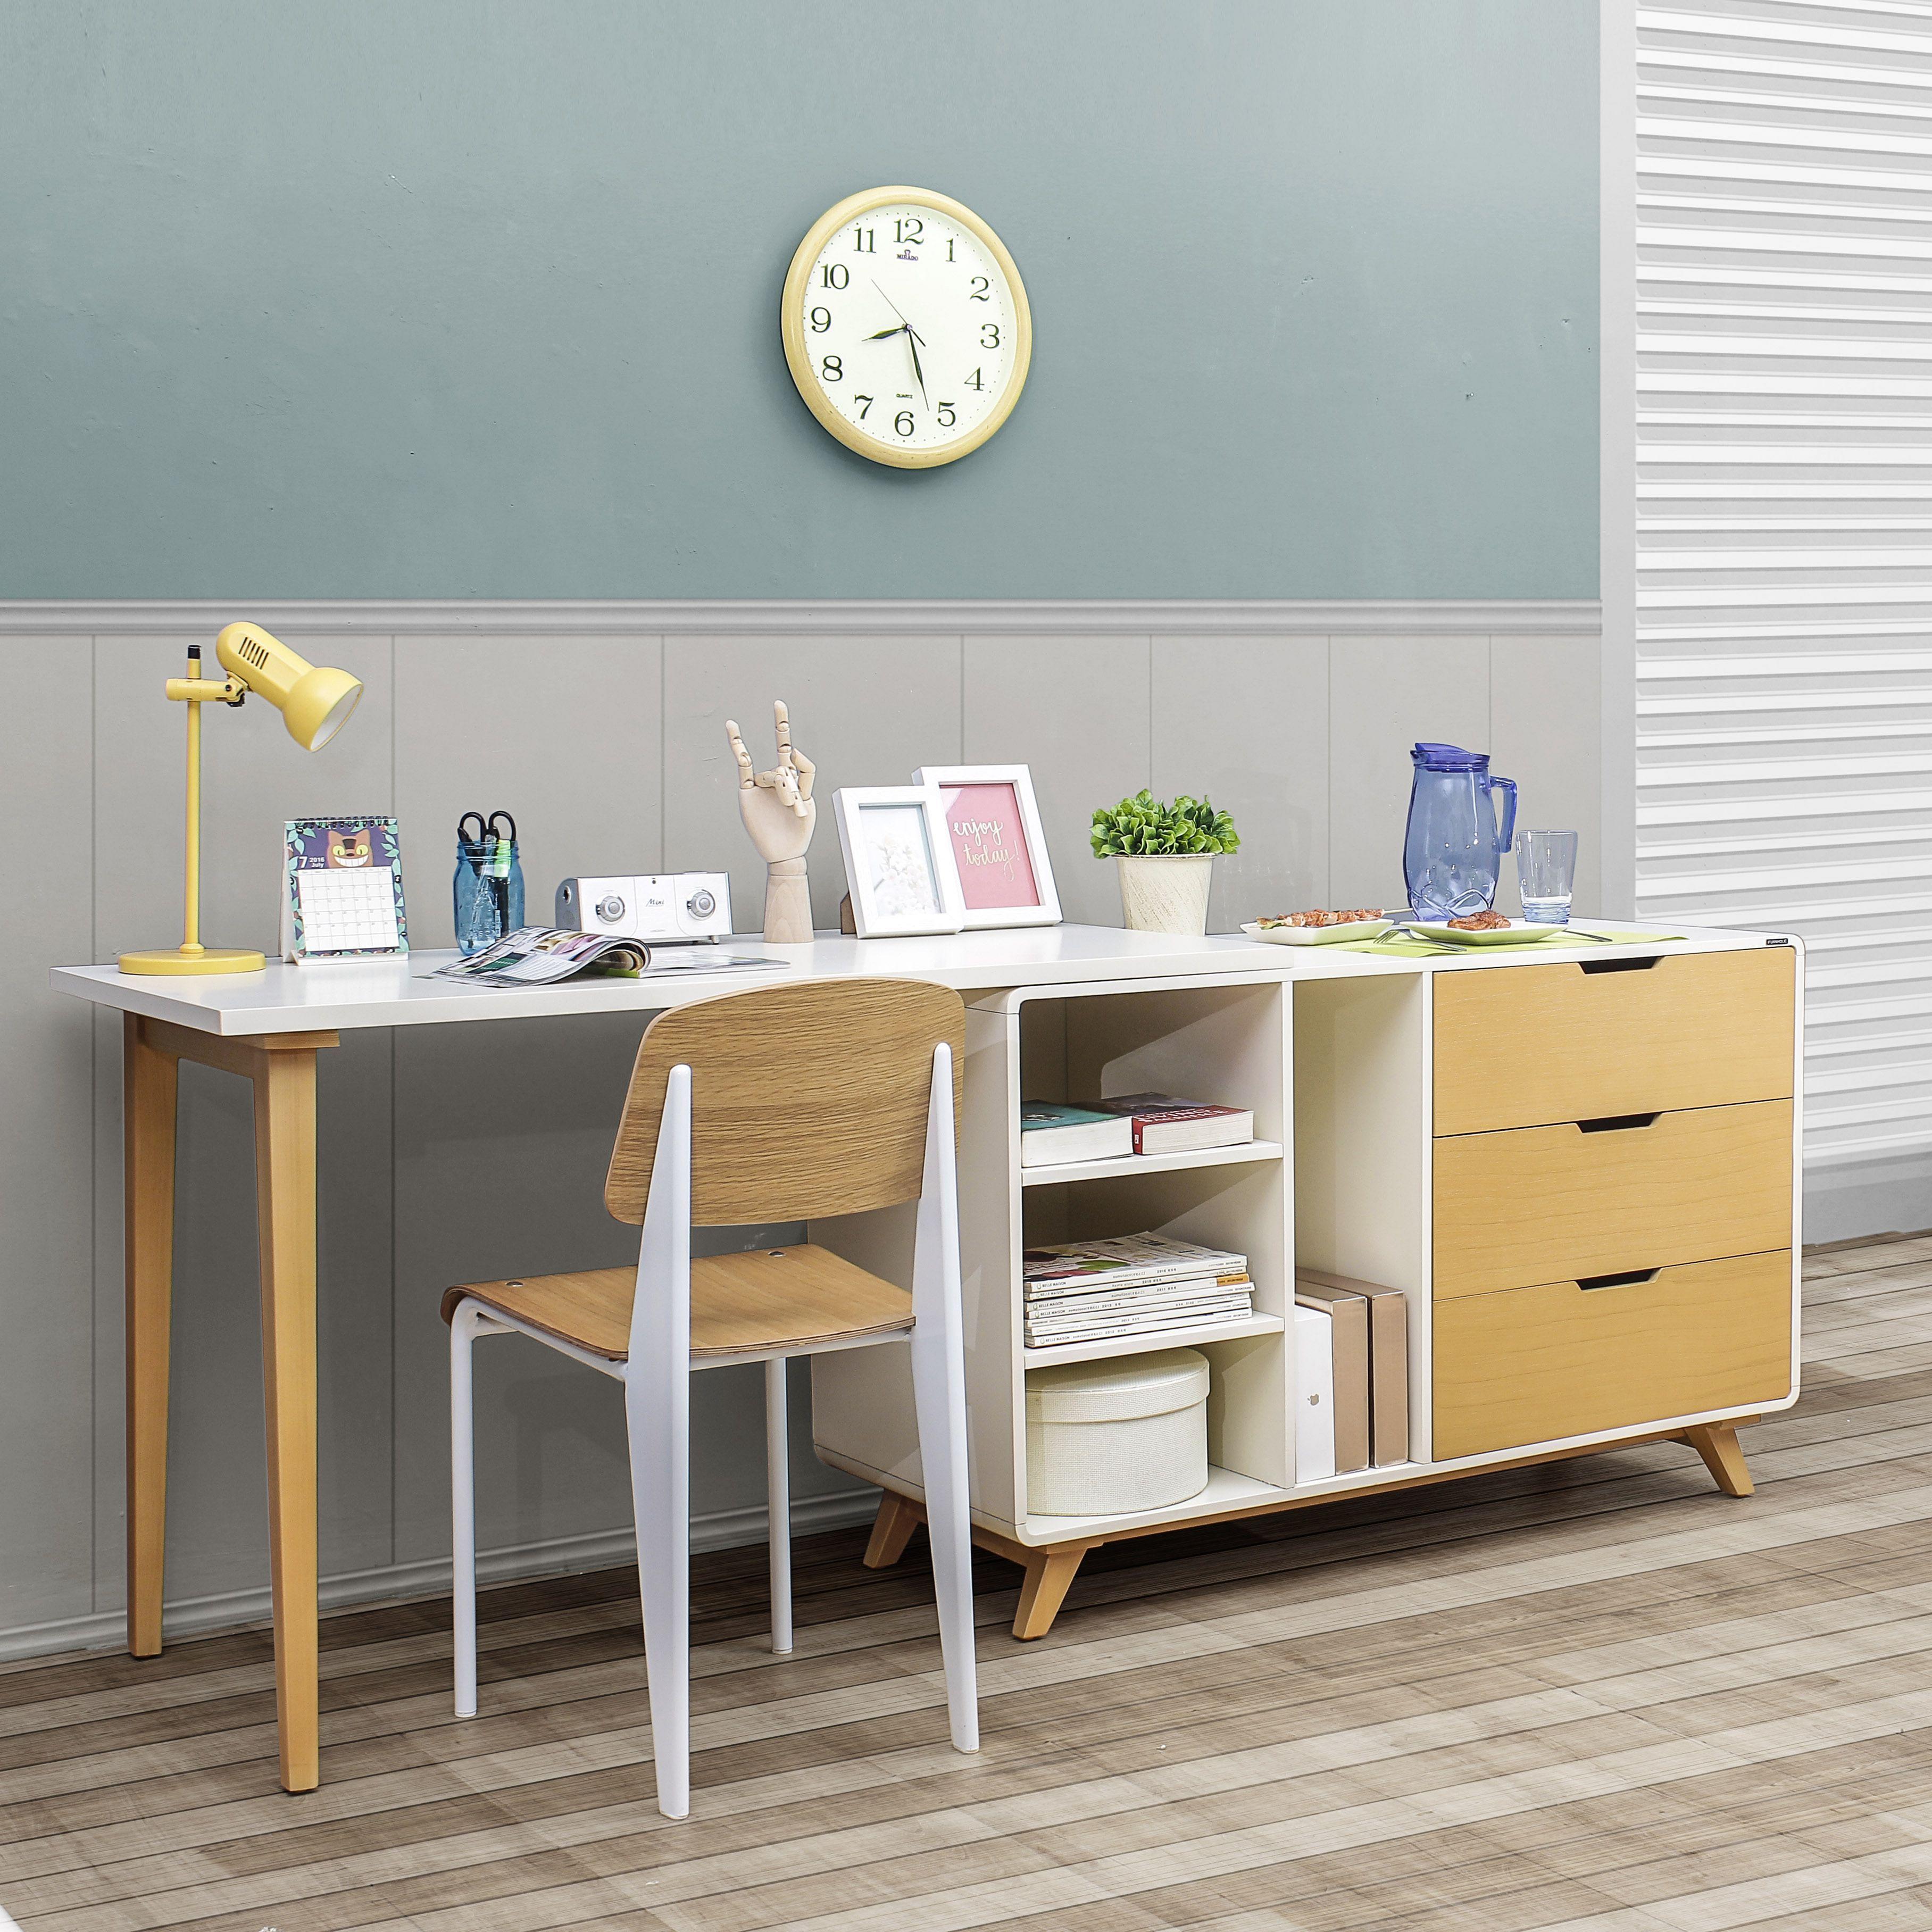 25 Amazing Study Desk Designs So That Children Learn Comfortably Desk Design Smart Table Study Desk